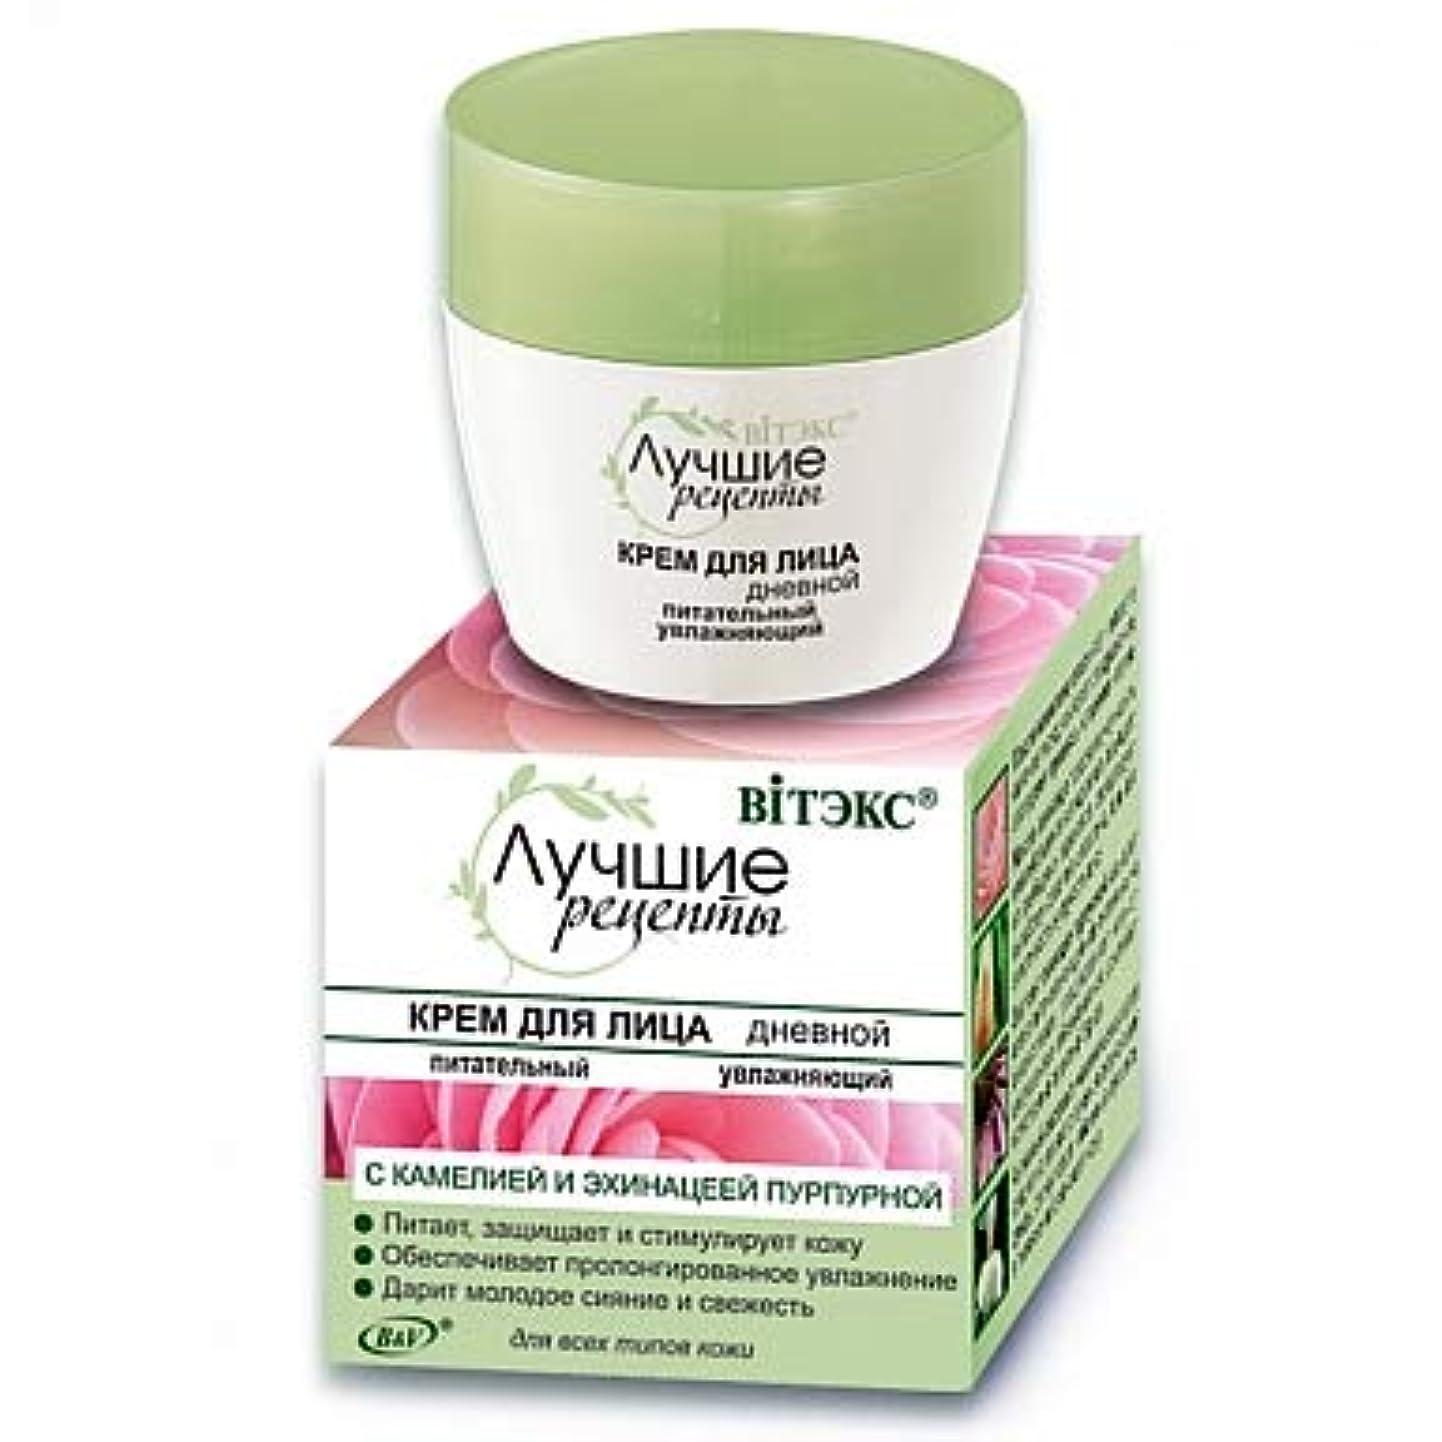 Bielita & Vitex Best Recipes Line | Nourishing Moisturizing Day Face Cream for All Skin Types, 45 ml | Camellia...